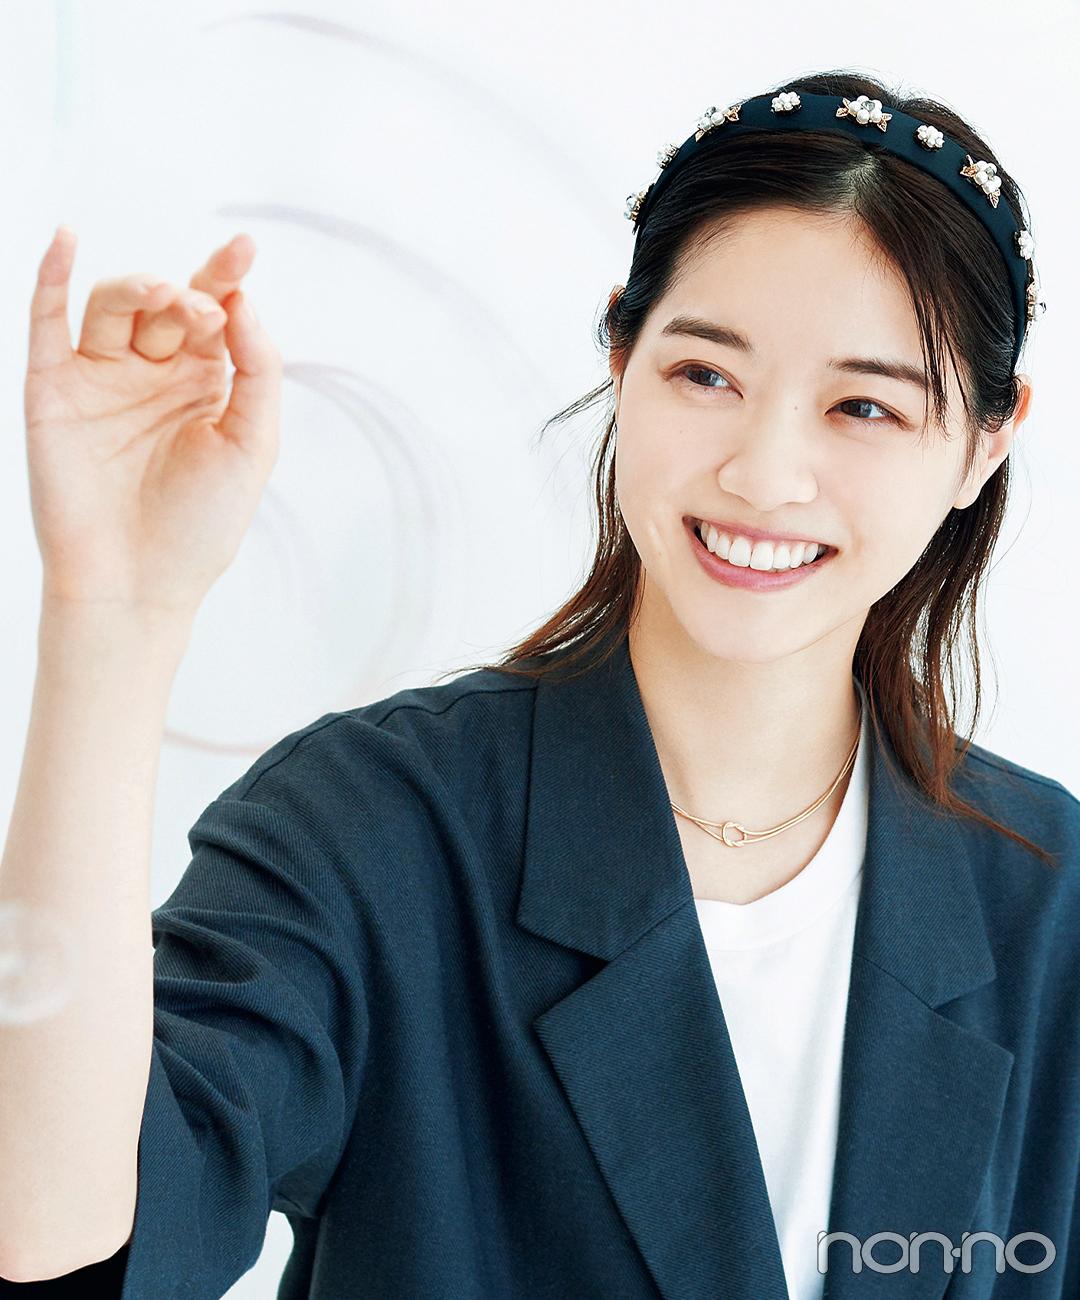 Photo Gallery|モデル・西野七瀬の最新フォトギャラリーを見る_1_4